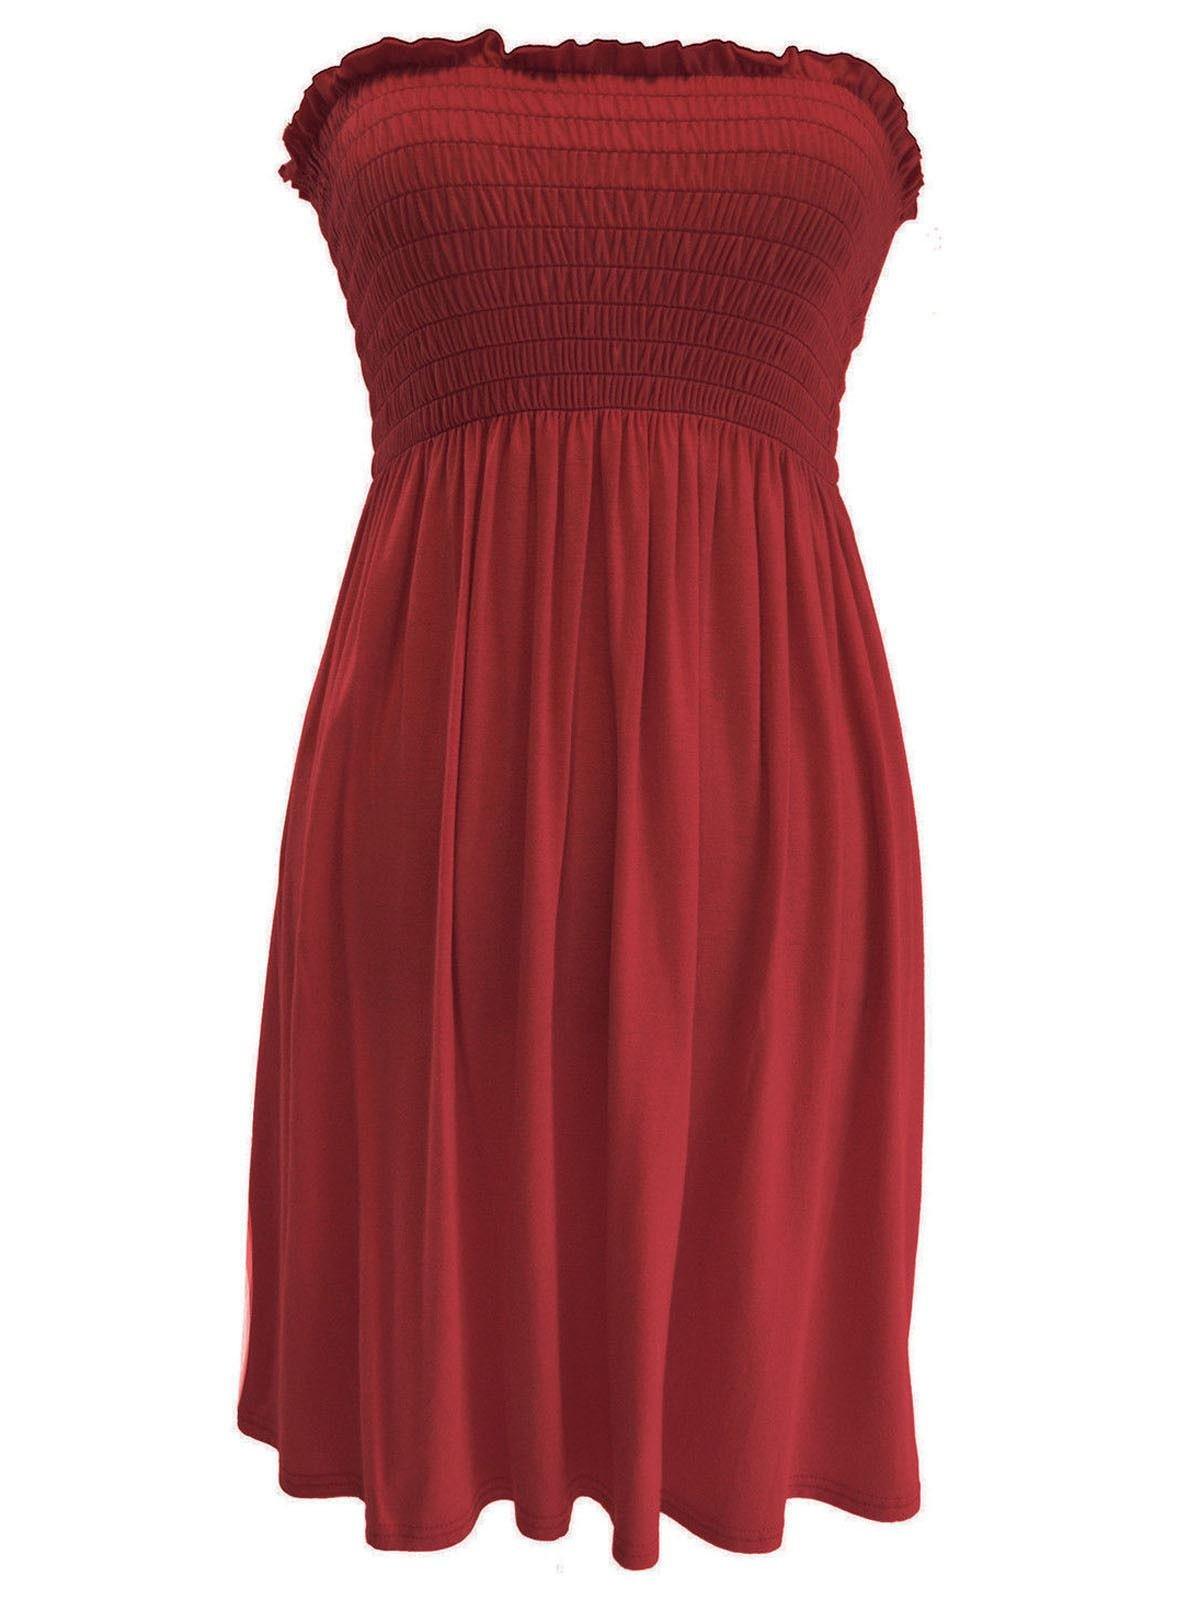 Available at Amazon: Rimi Hanger Women's Sheering Boobtube Gather Bandeau Top Ladies Strapless Summer Mini Dress S/XXL